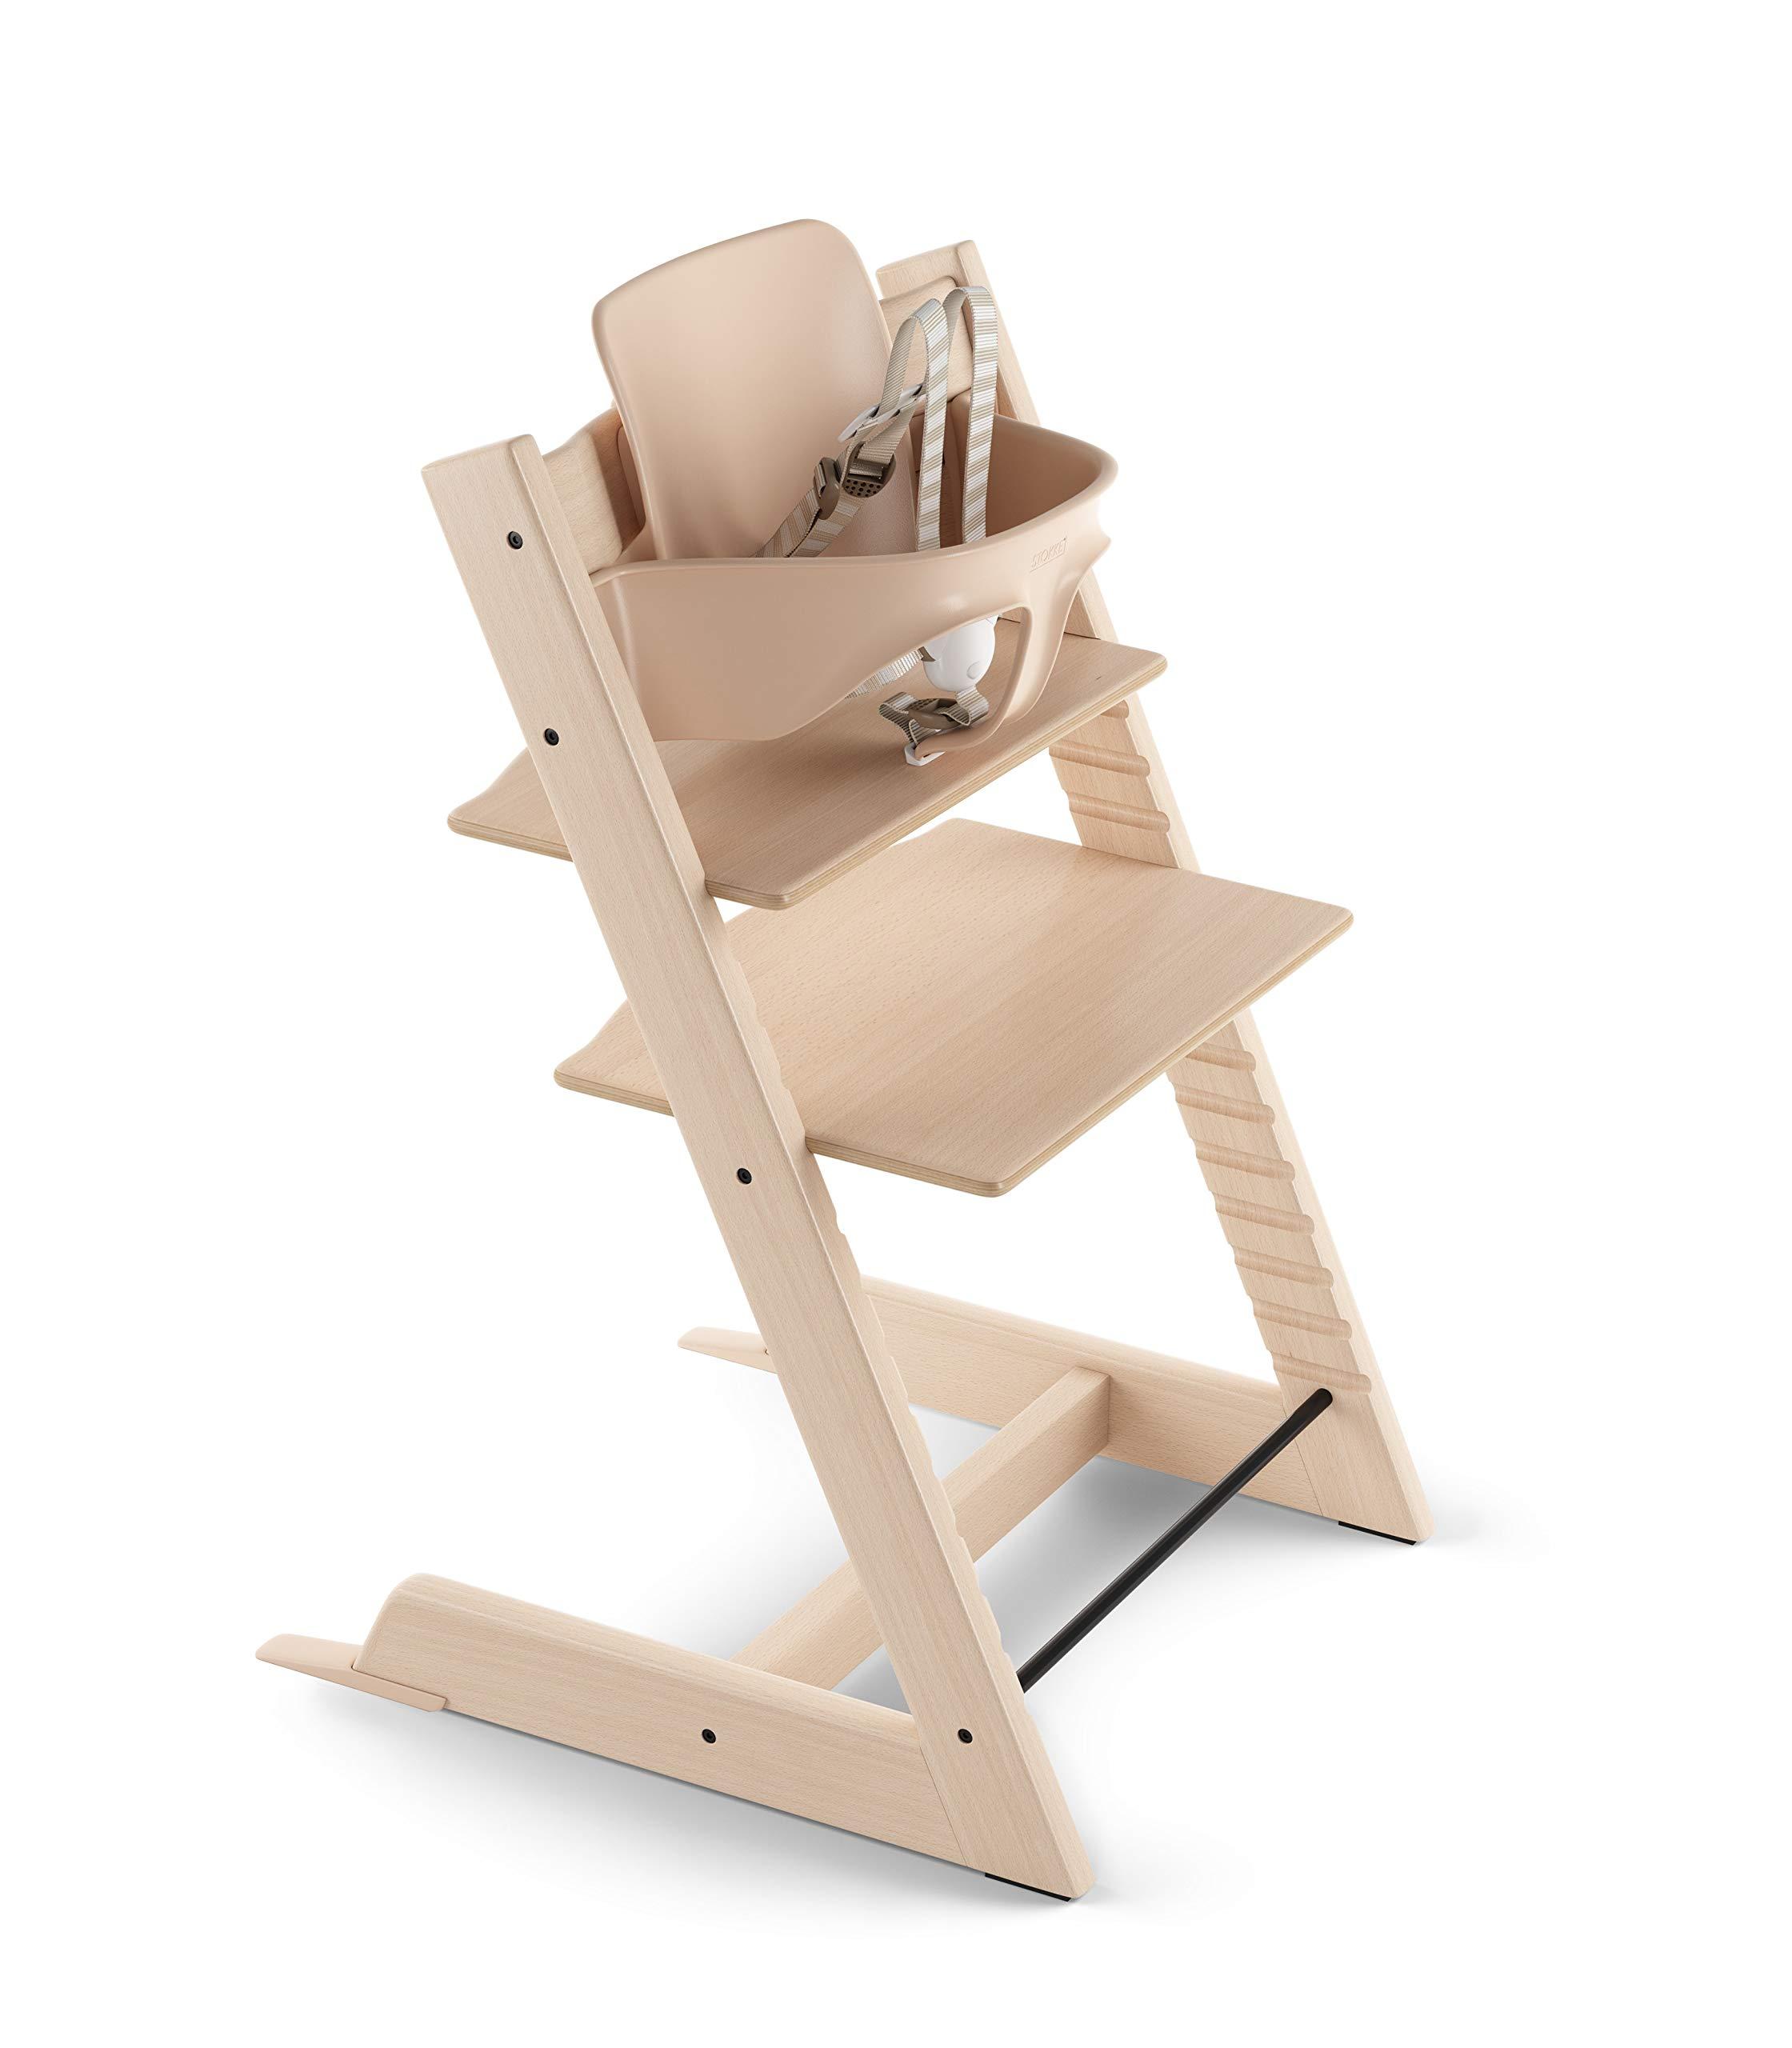 Stokke tray white childrens highchair for Stokke tripp trapp amazon